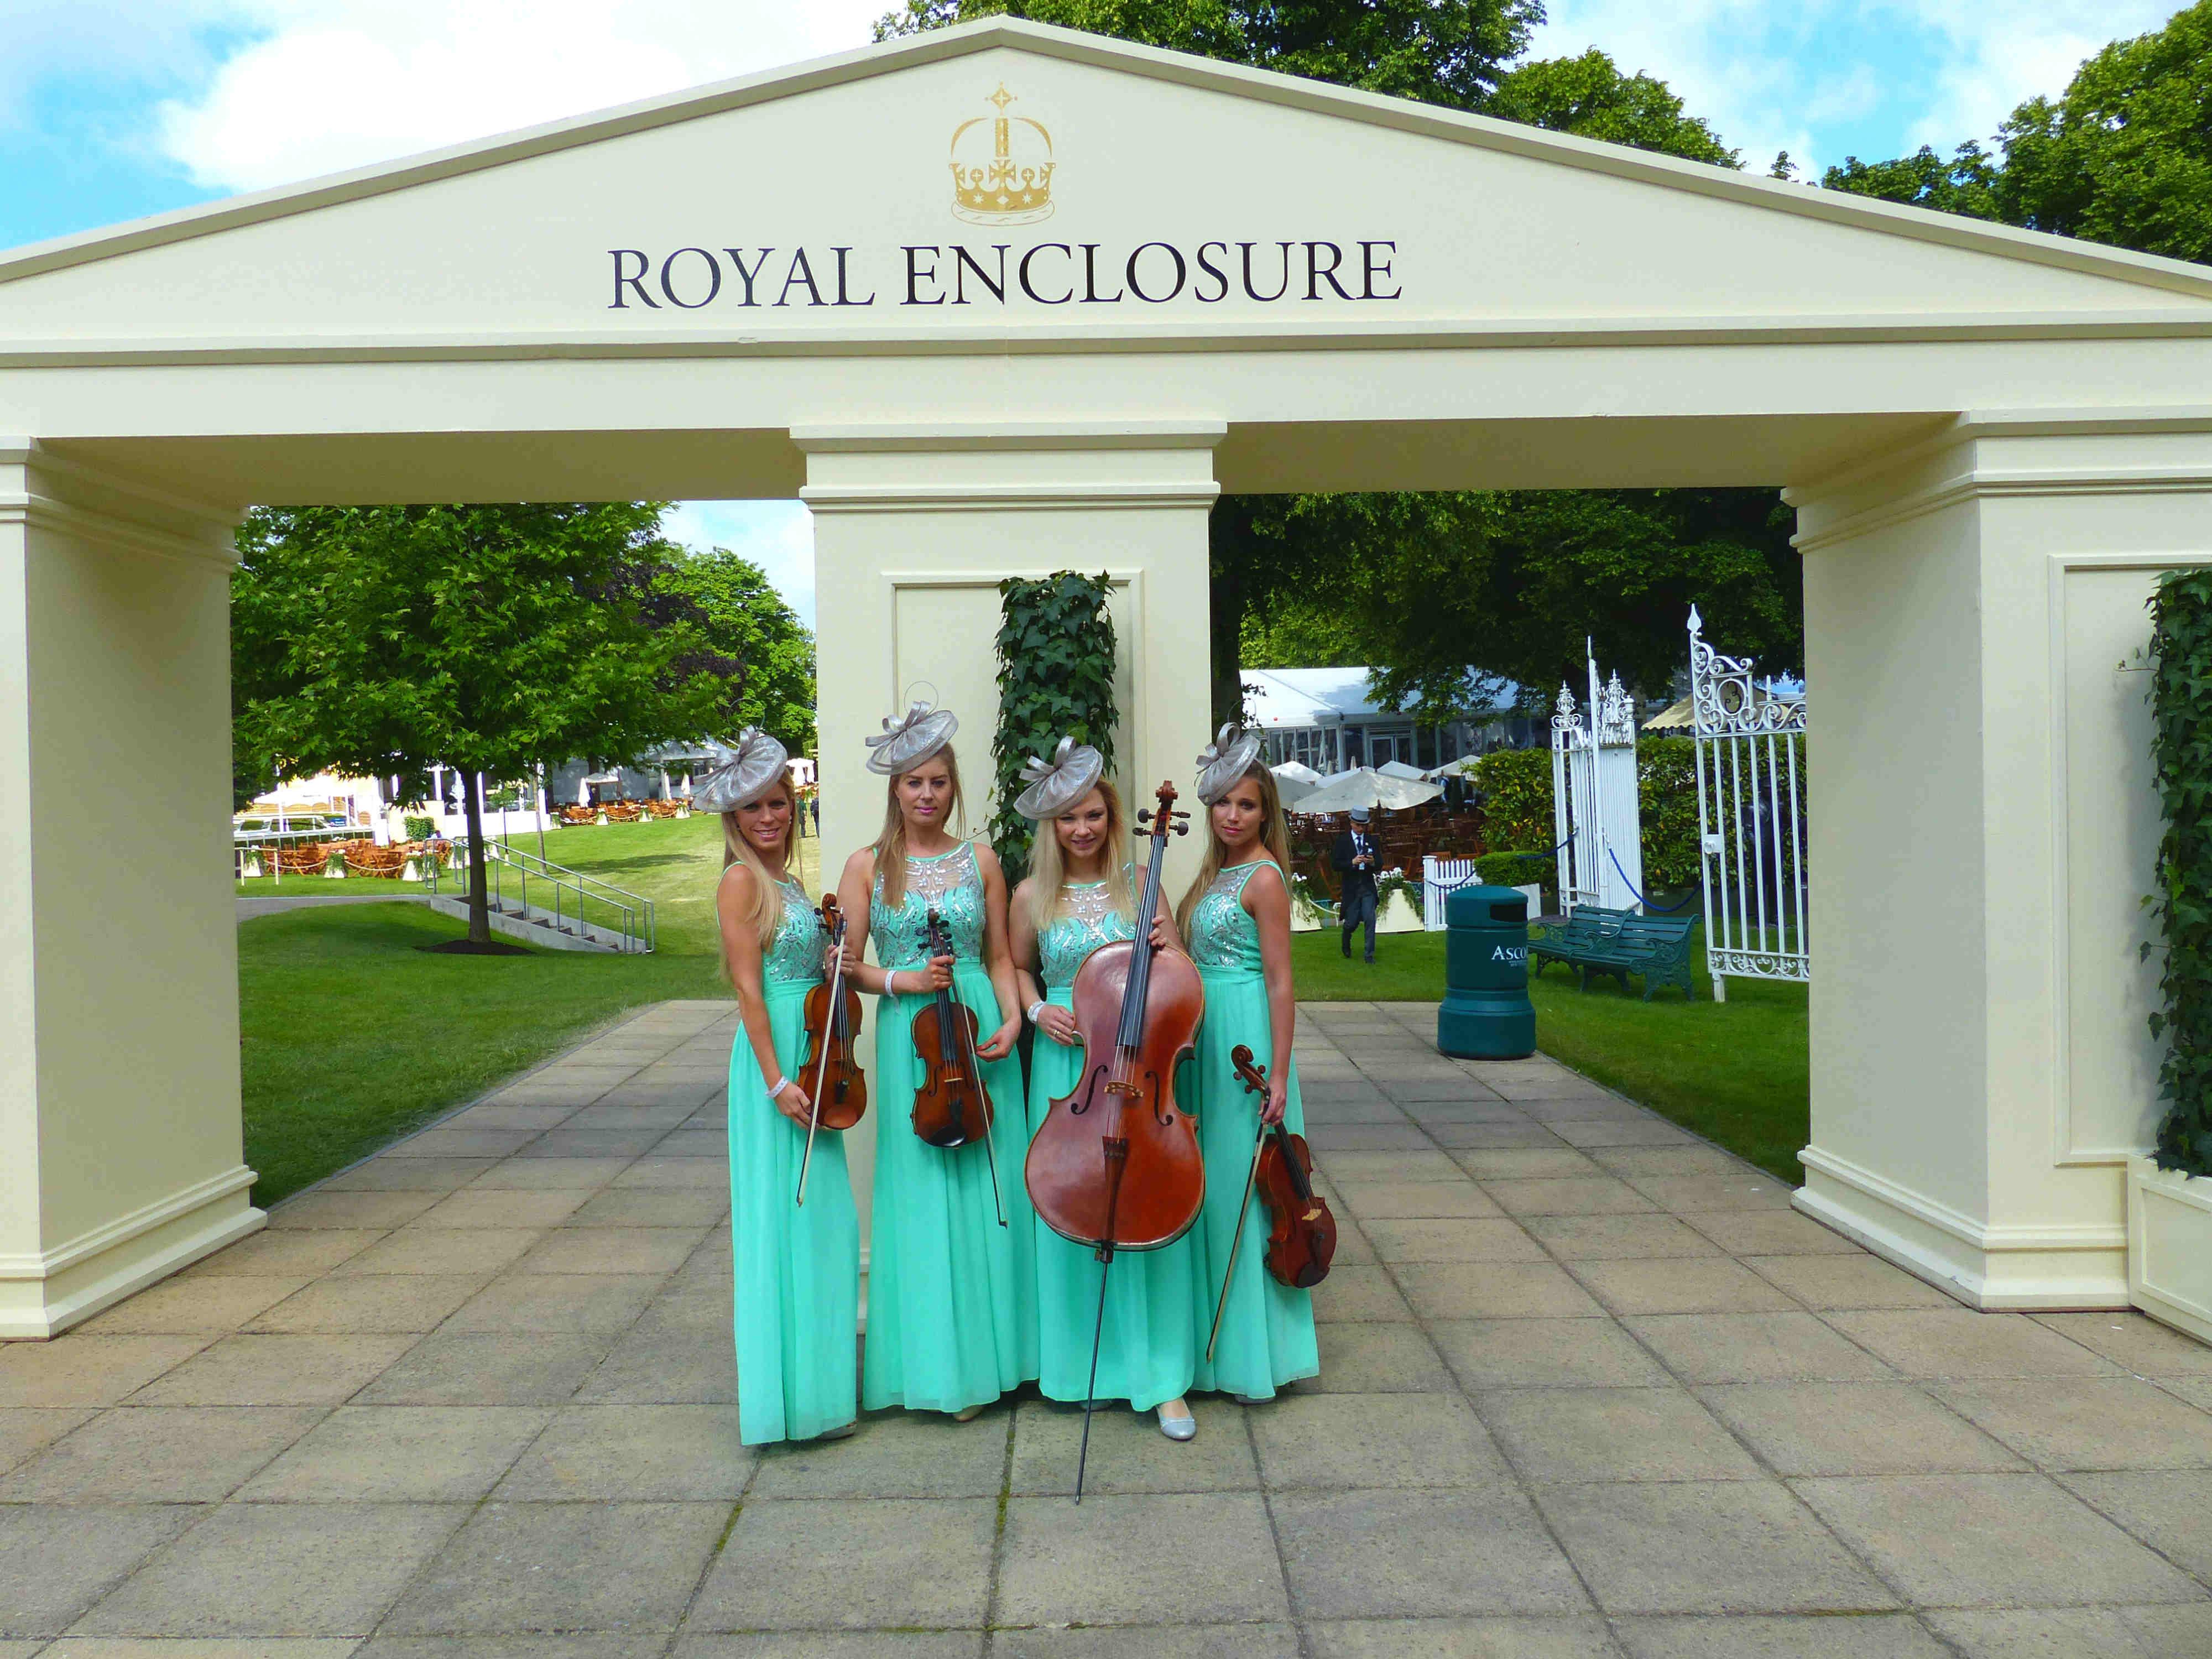 Royal Ascot Enclosure